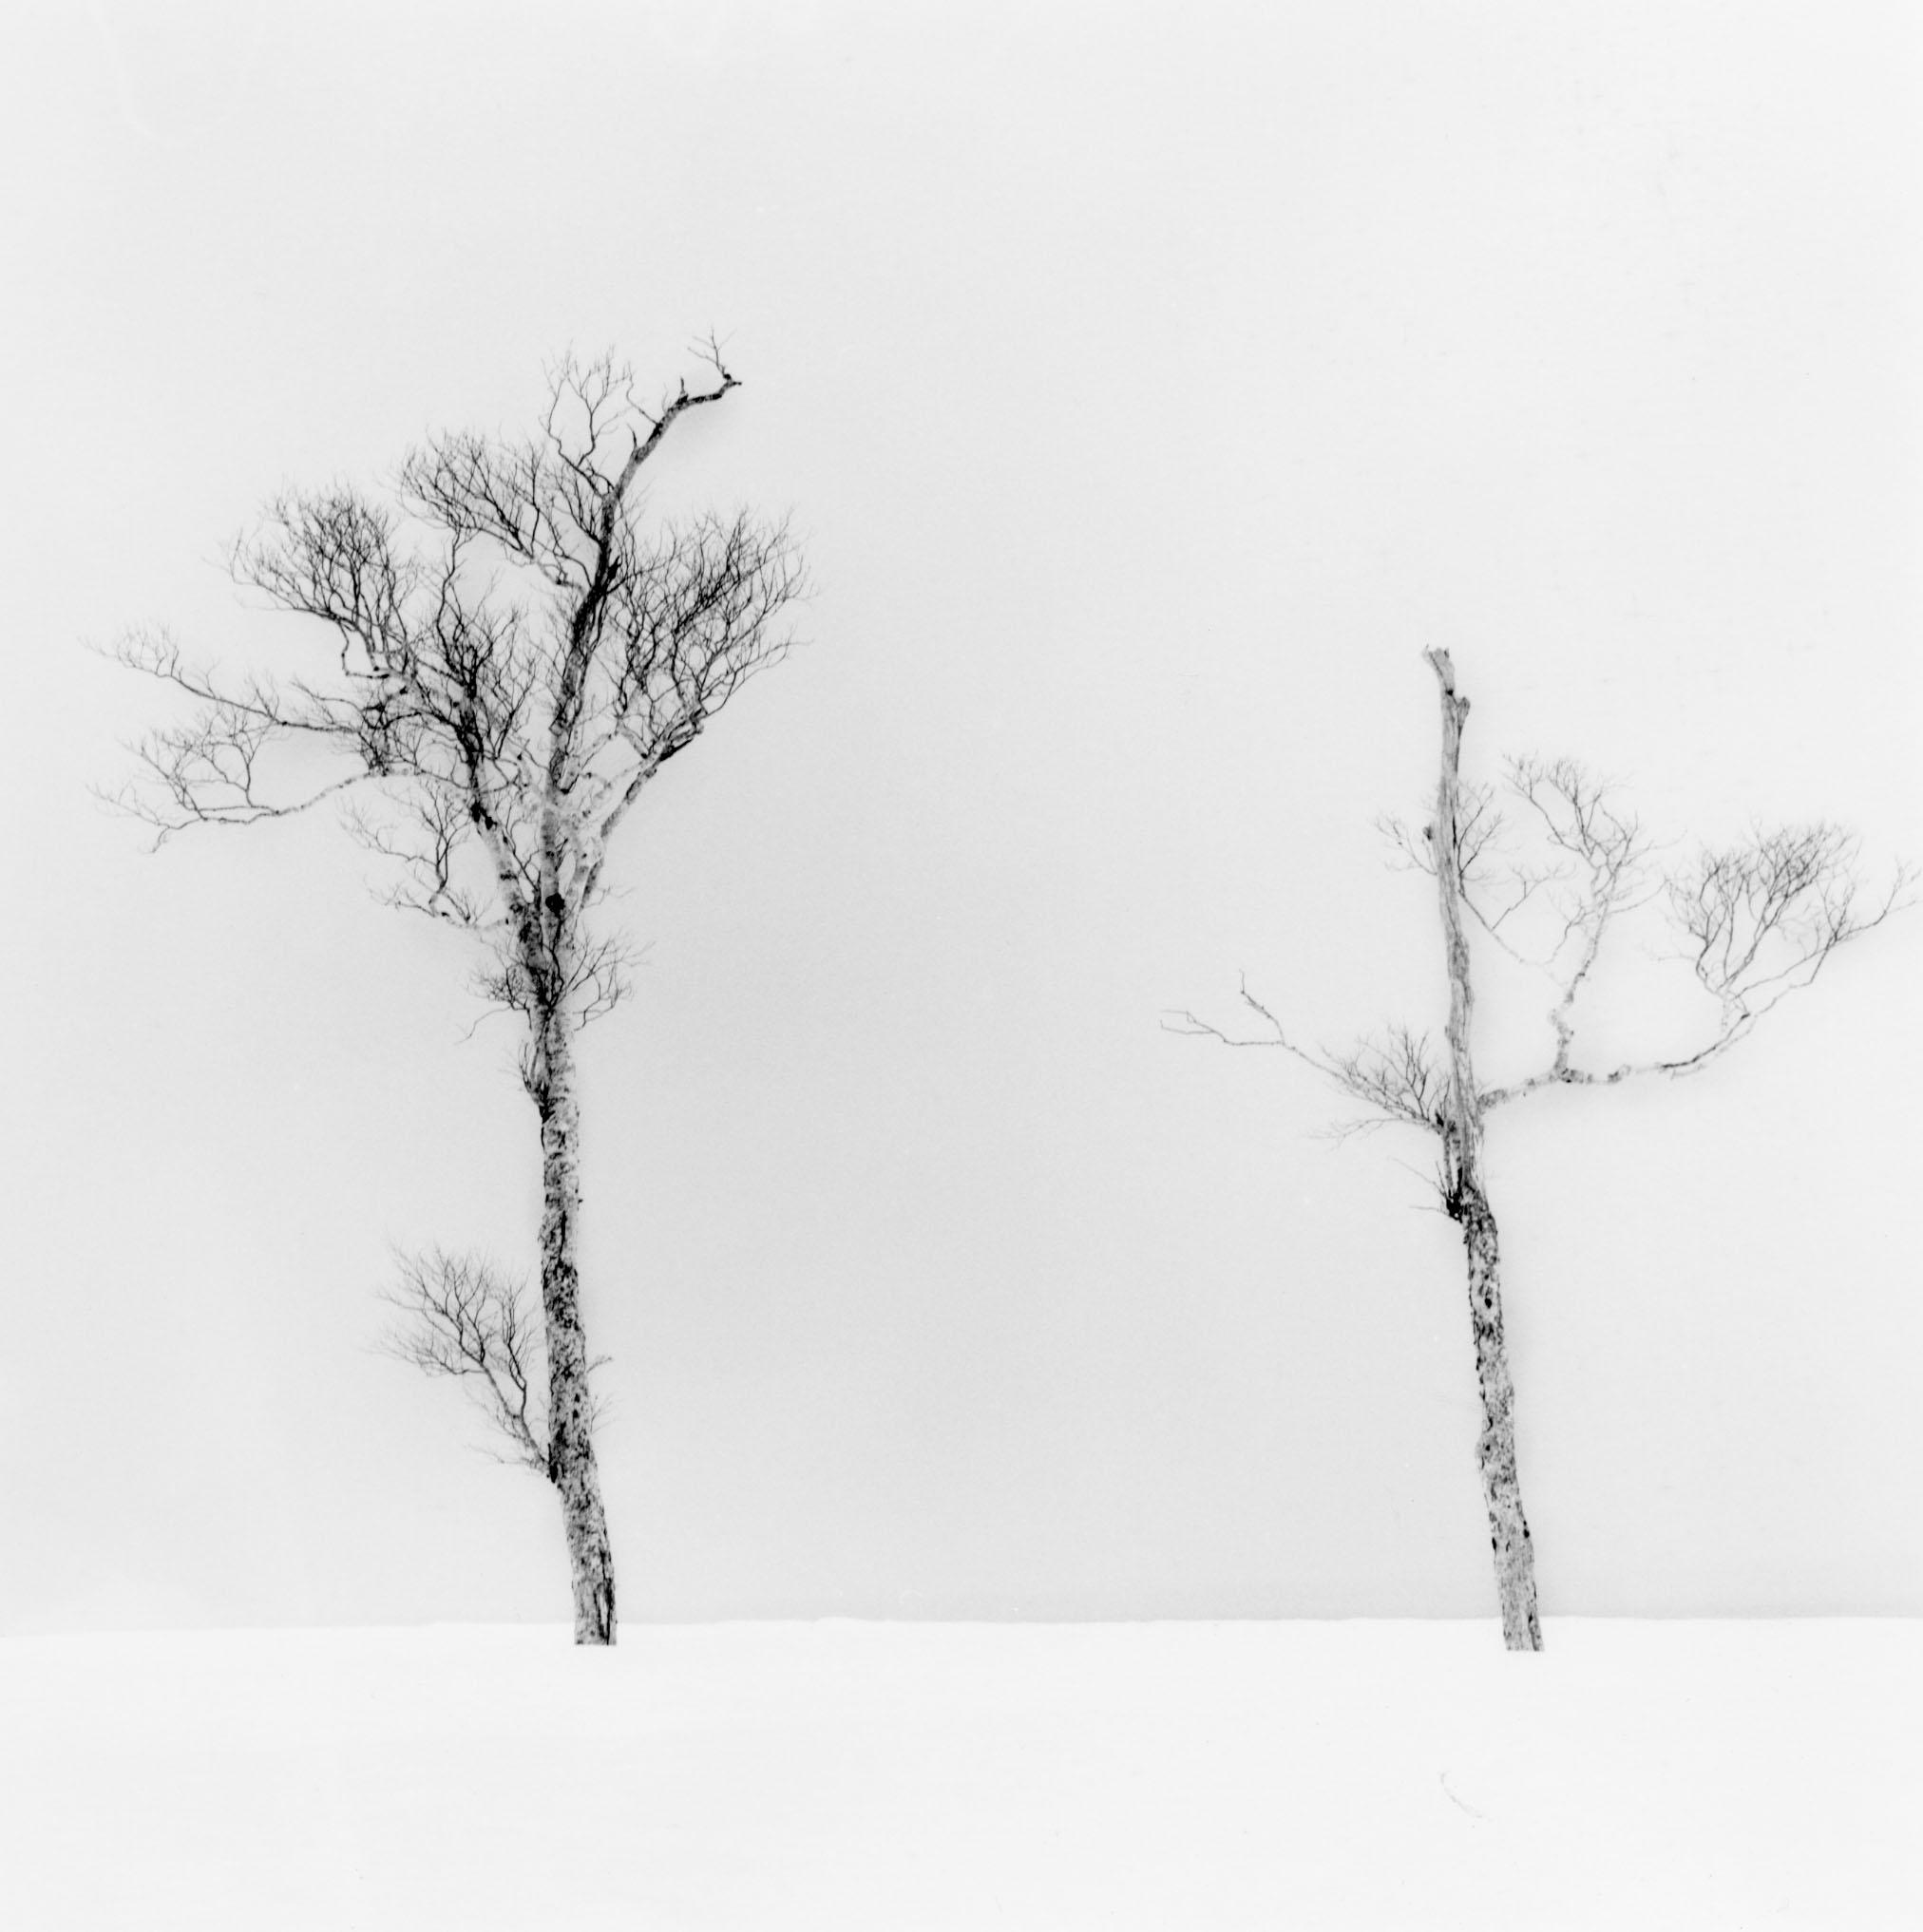 Linda Fitch, Two Trees, Study 5, Lake Kusshard, Hokkaido